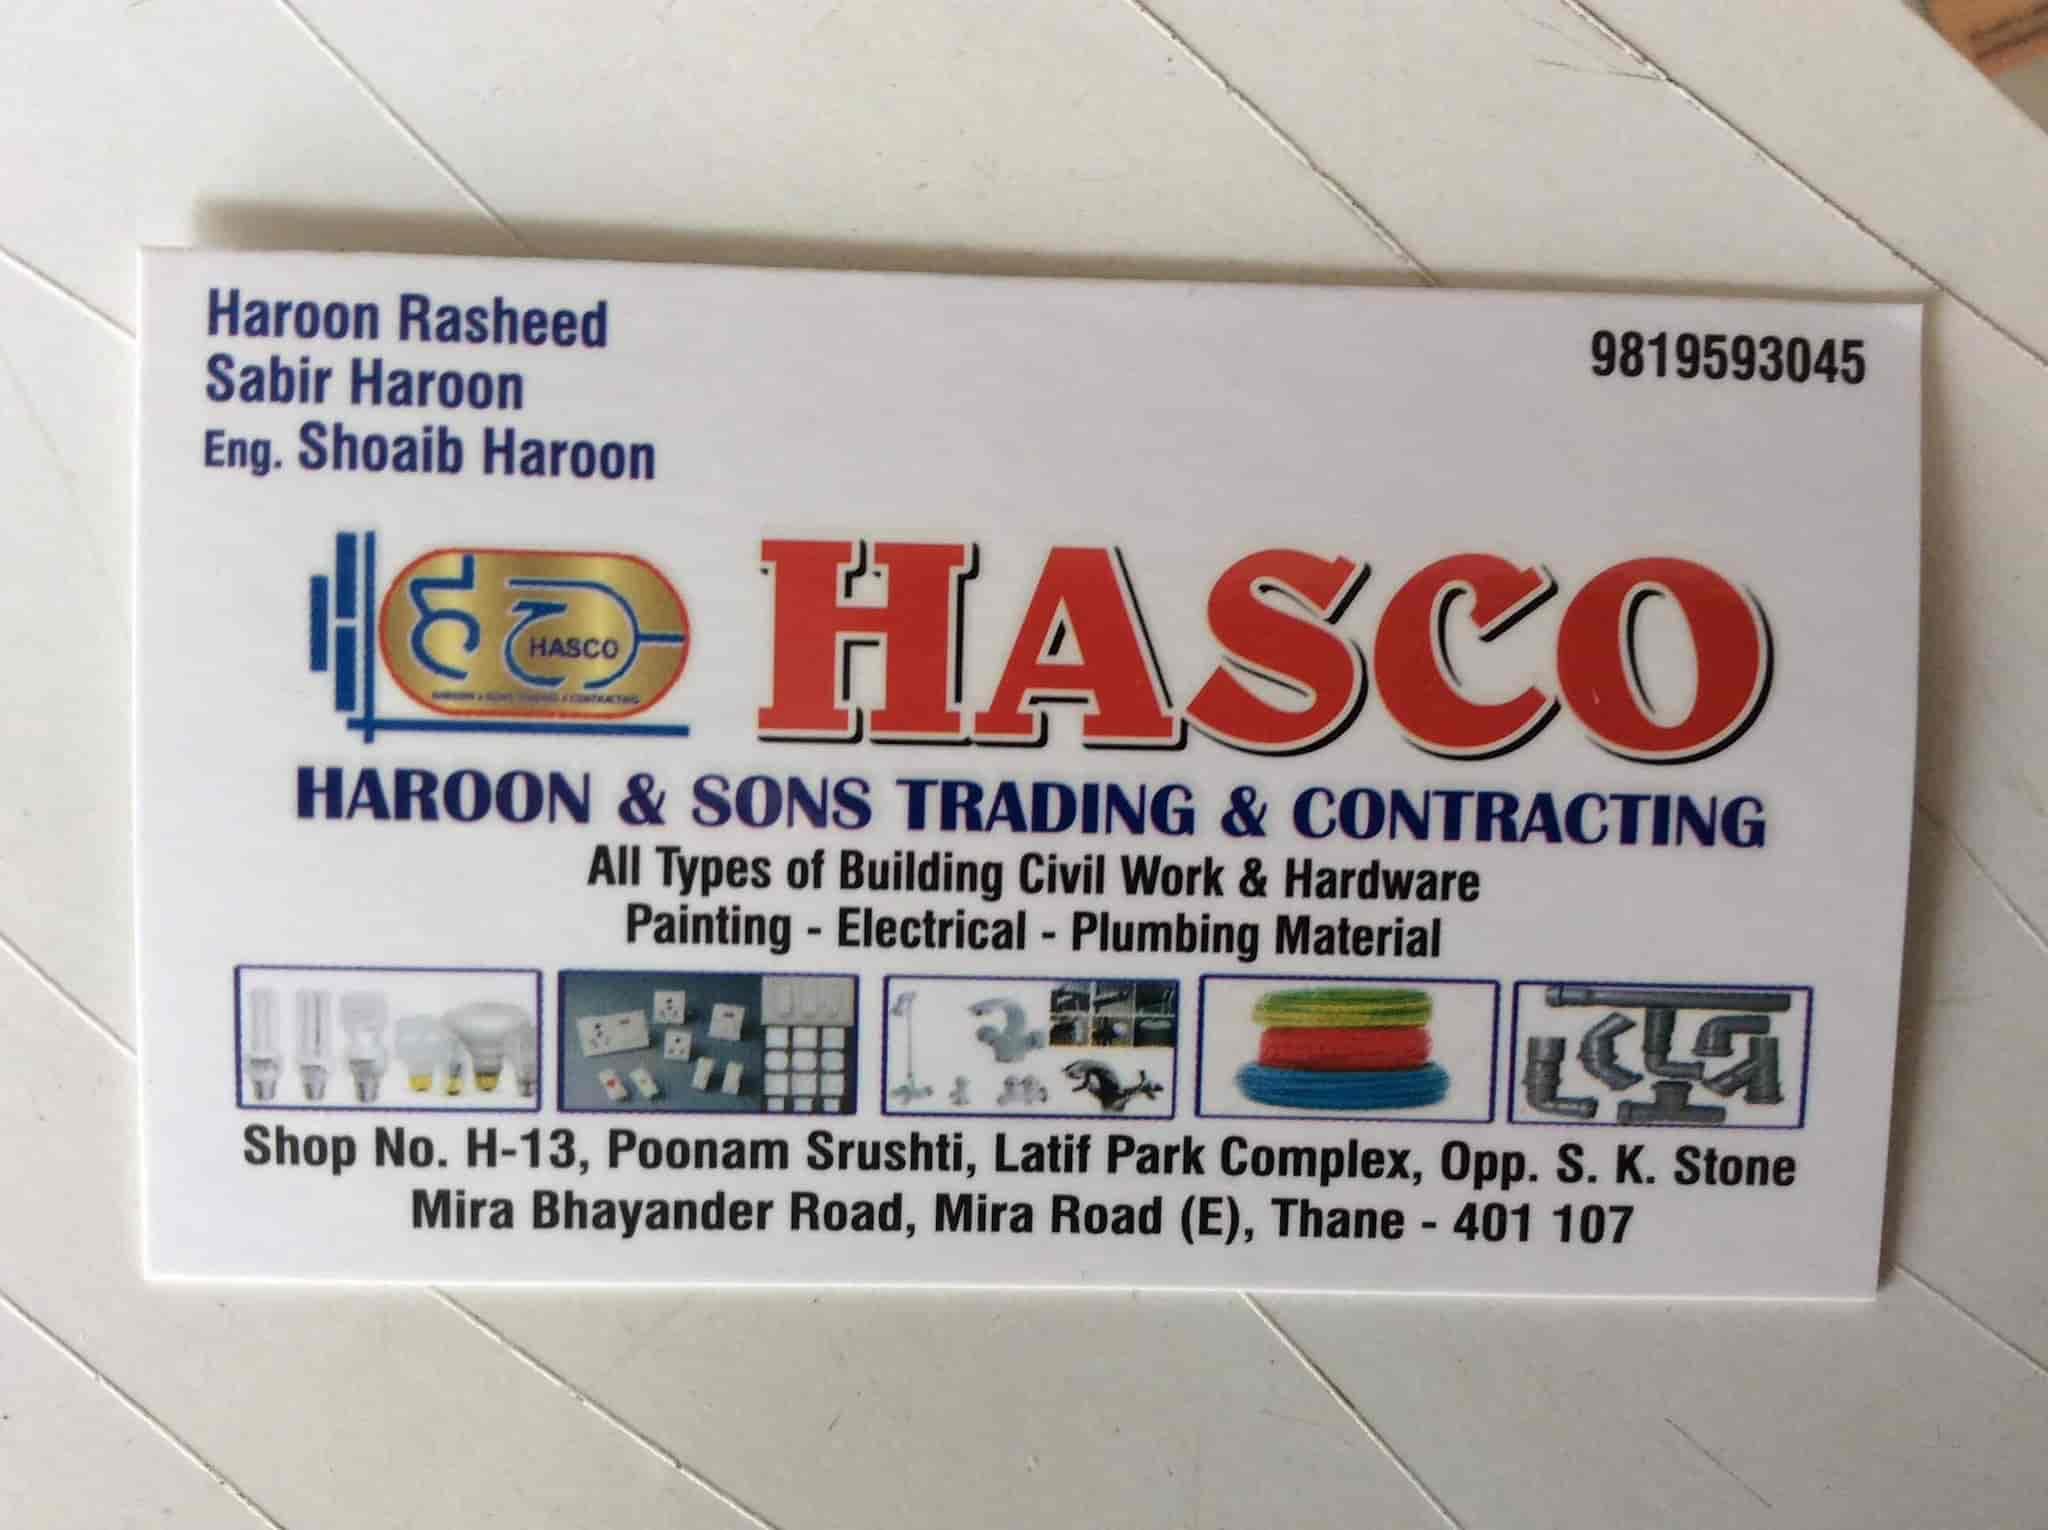 Hasco Haroon Sons Trading Contracting Photos, Mira Road